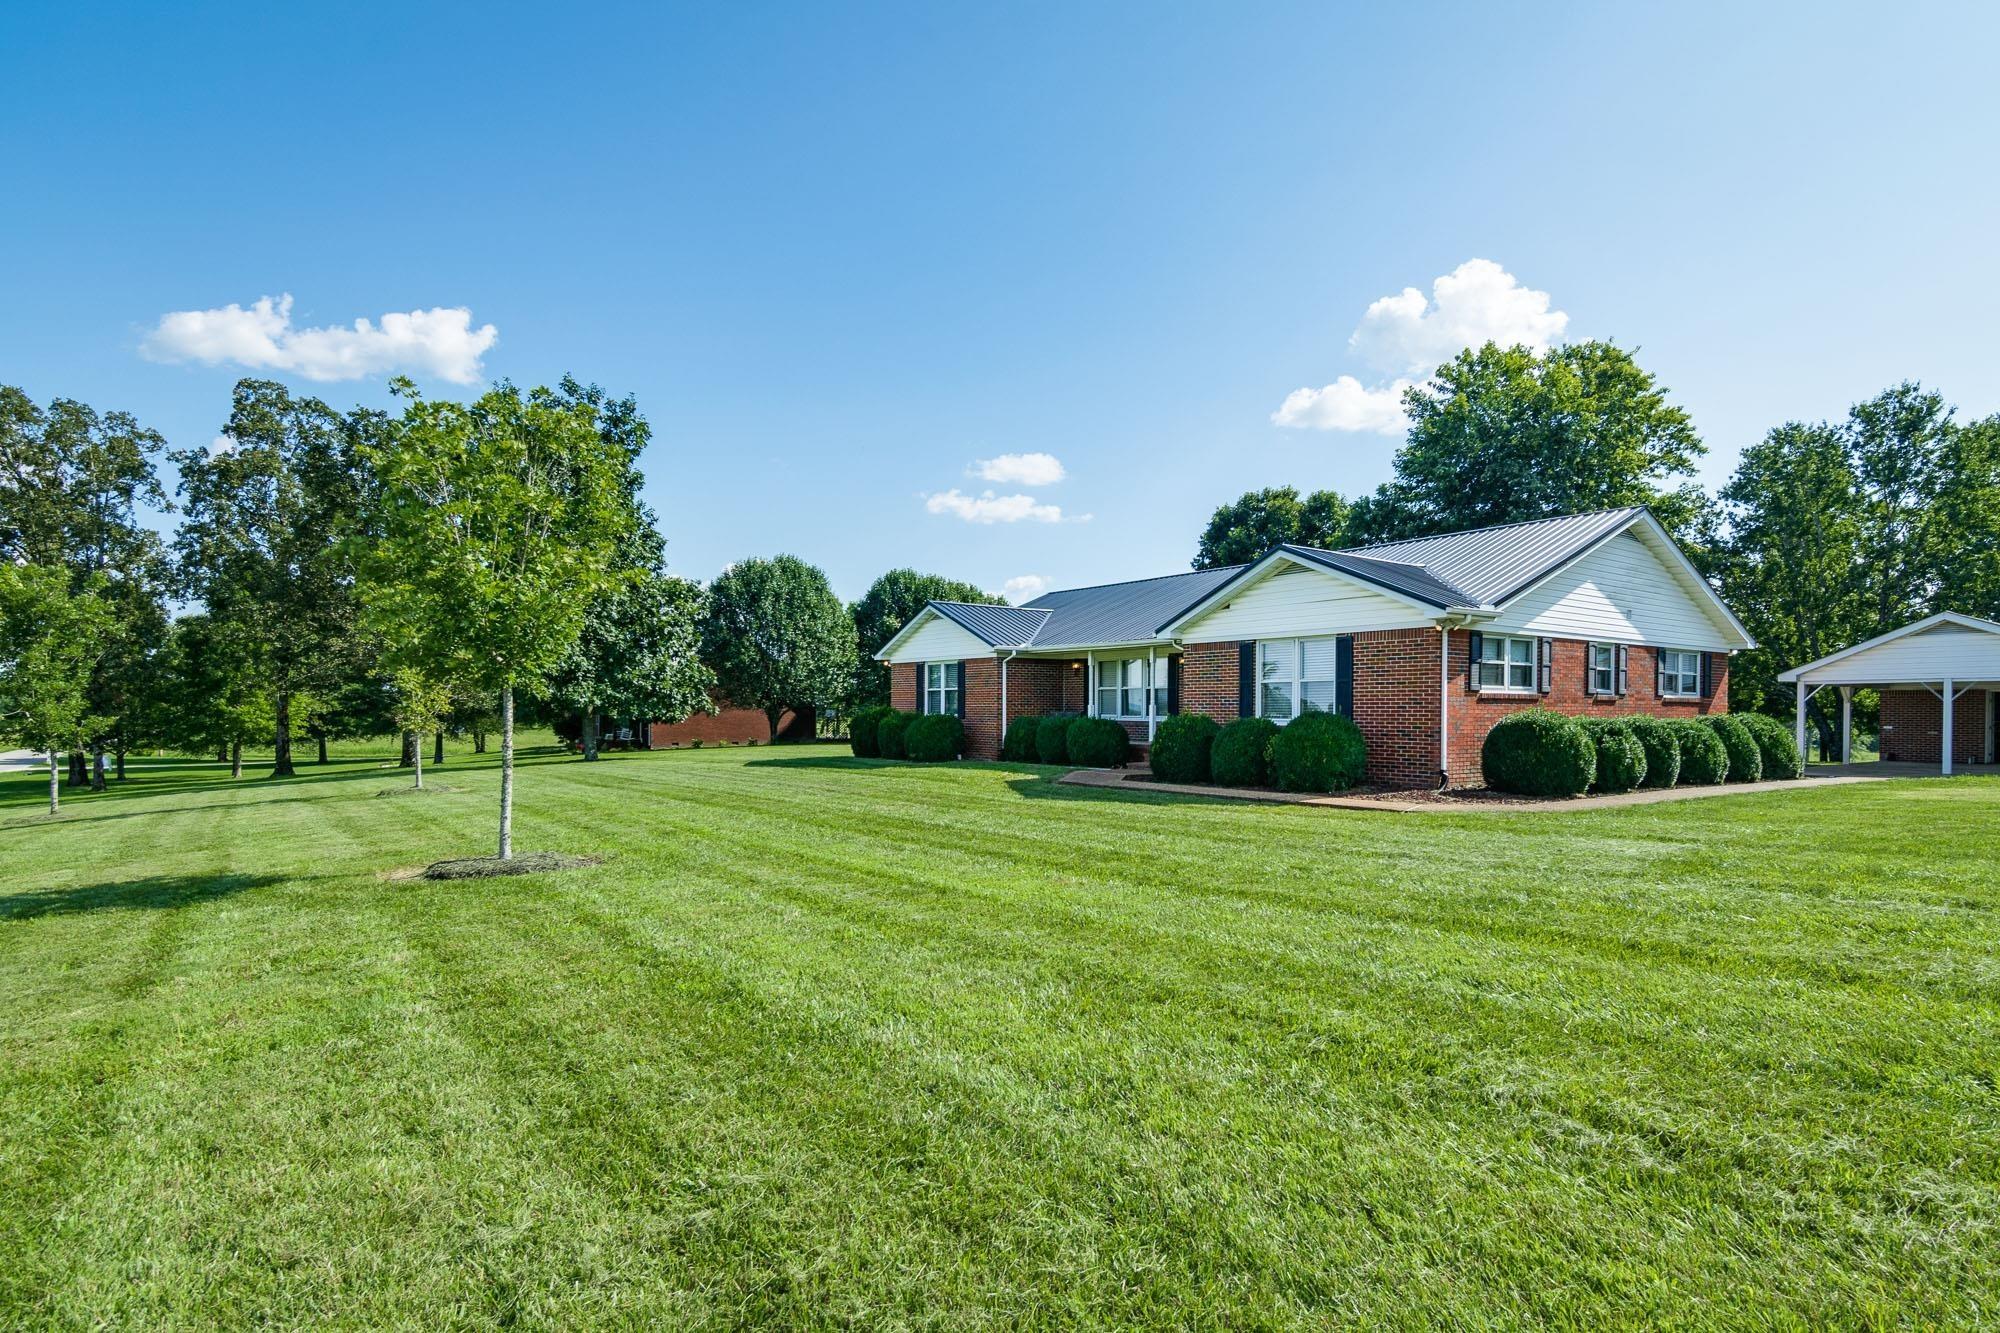 6577 Lucky Rd, Mc Minnville, TN 37110 - Mc Minnville, TN real estate listing